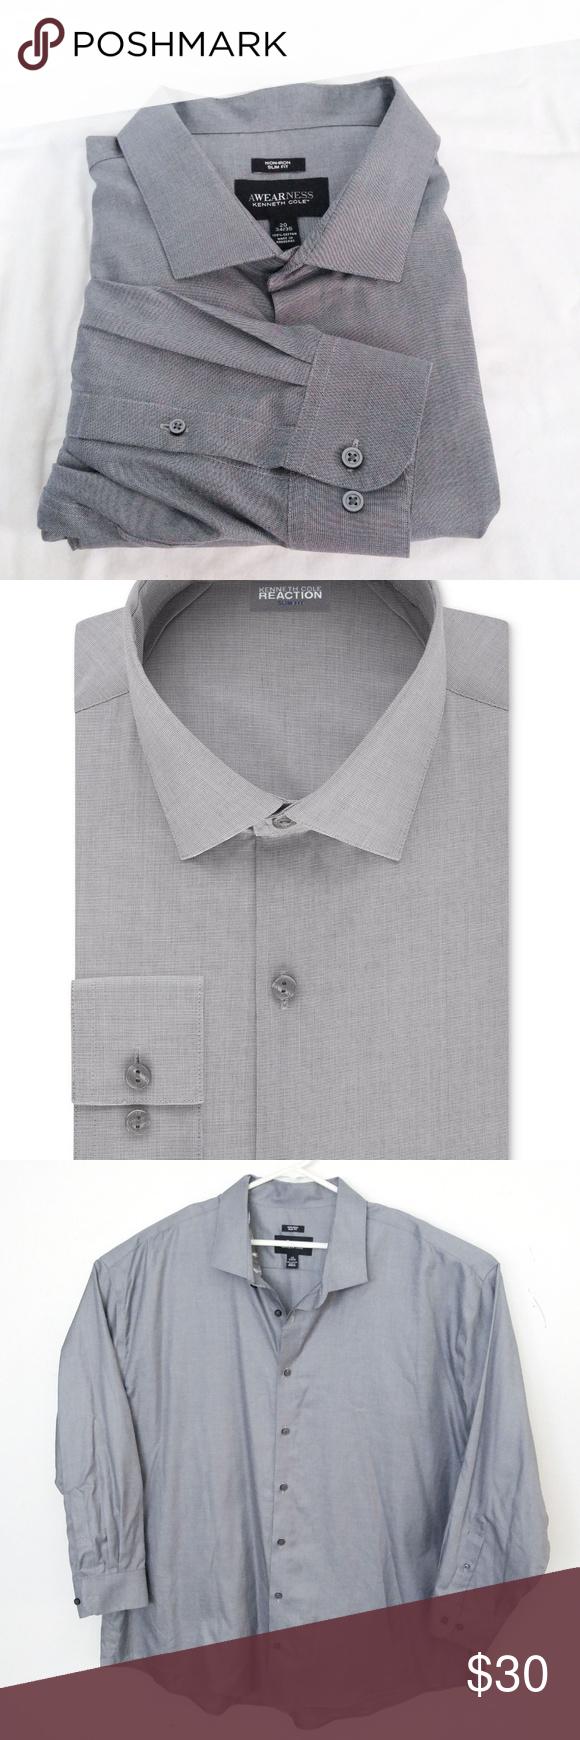 Kenneth Cole Reaction Slim Fit Dress Shirt Sz 20 In 2018 My Posh